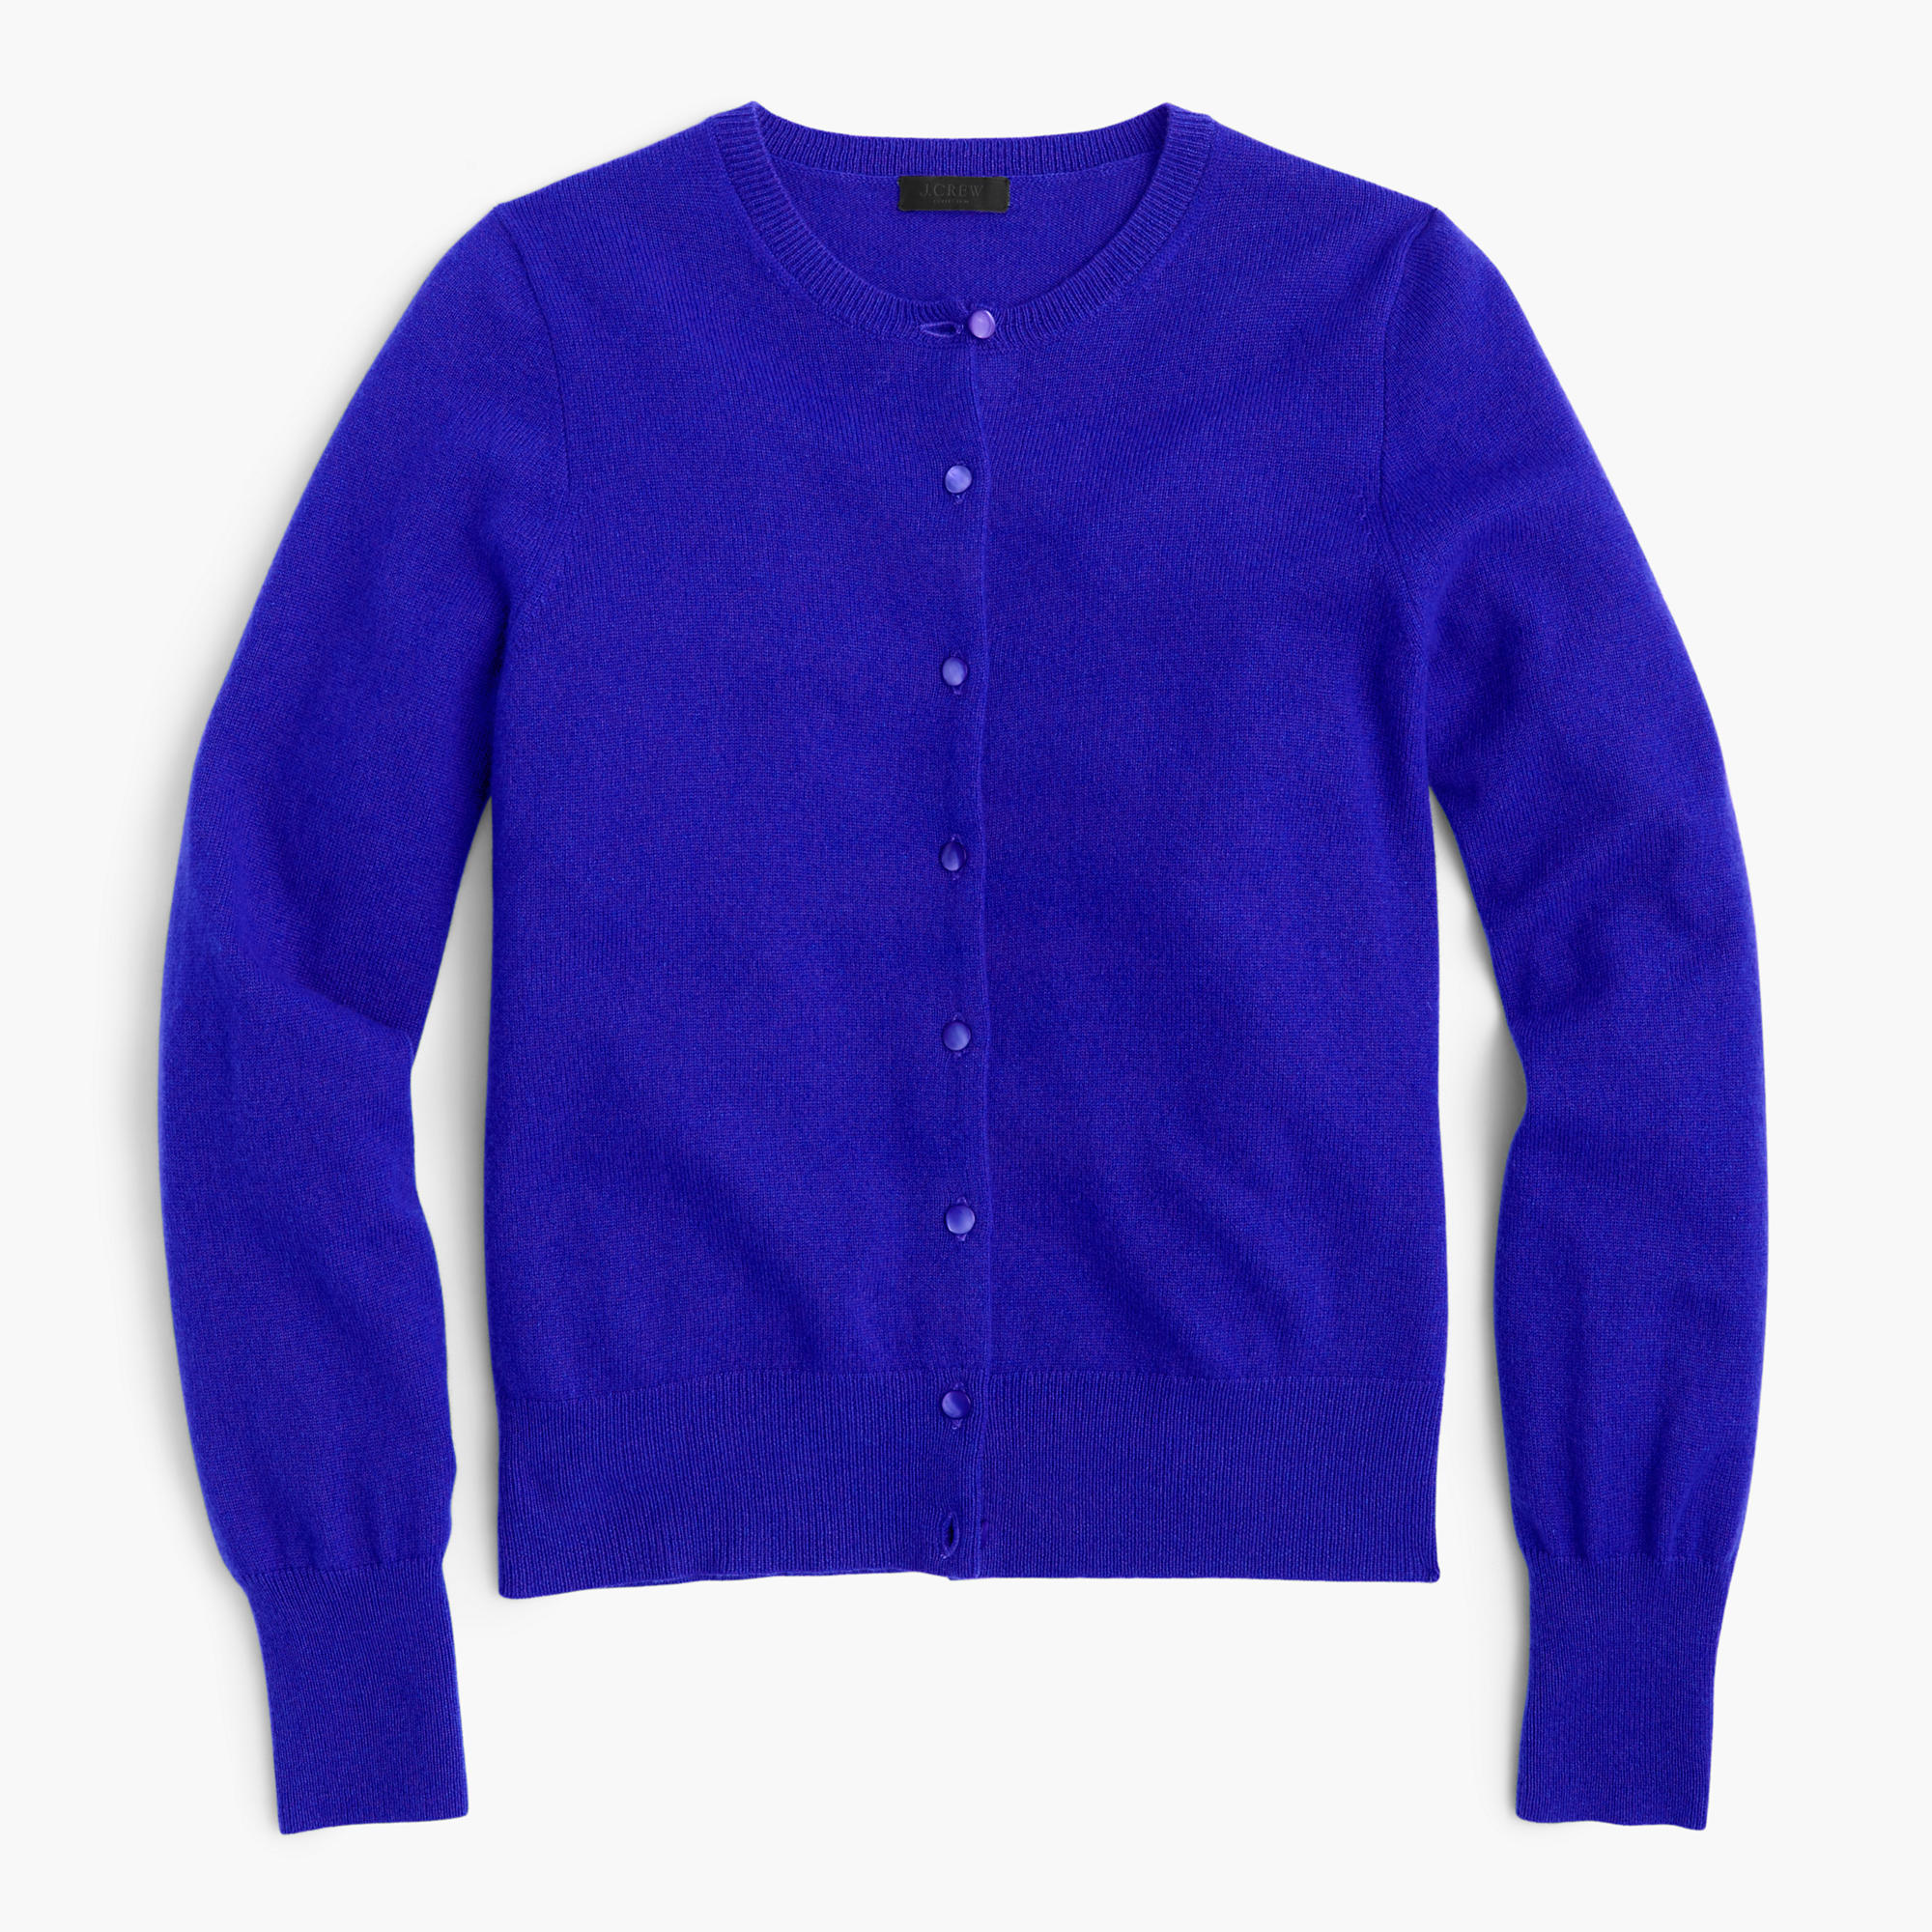 Italian Cashmere Cardigan Sweater : Women's Cashmere ...